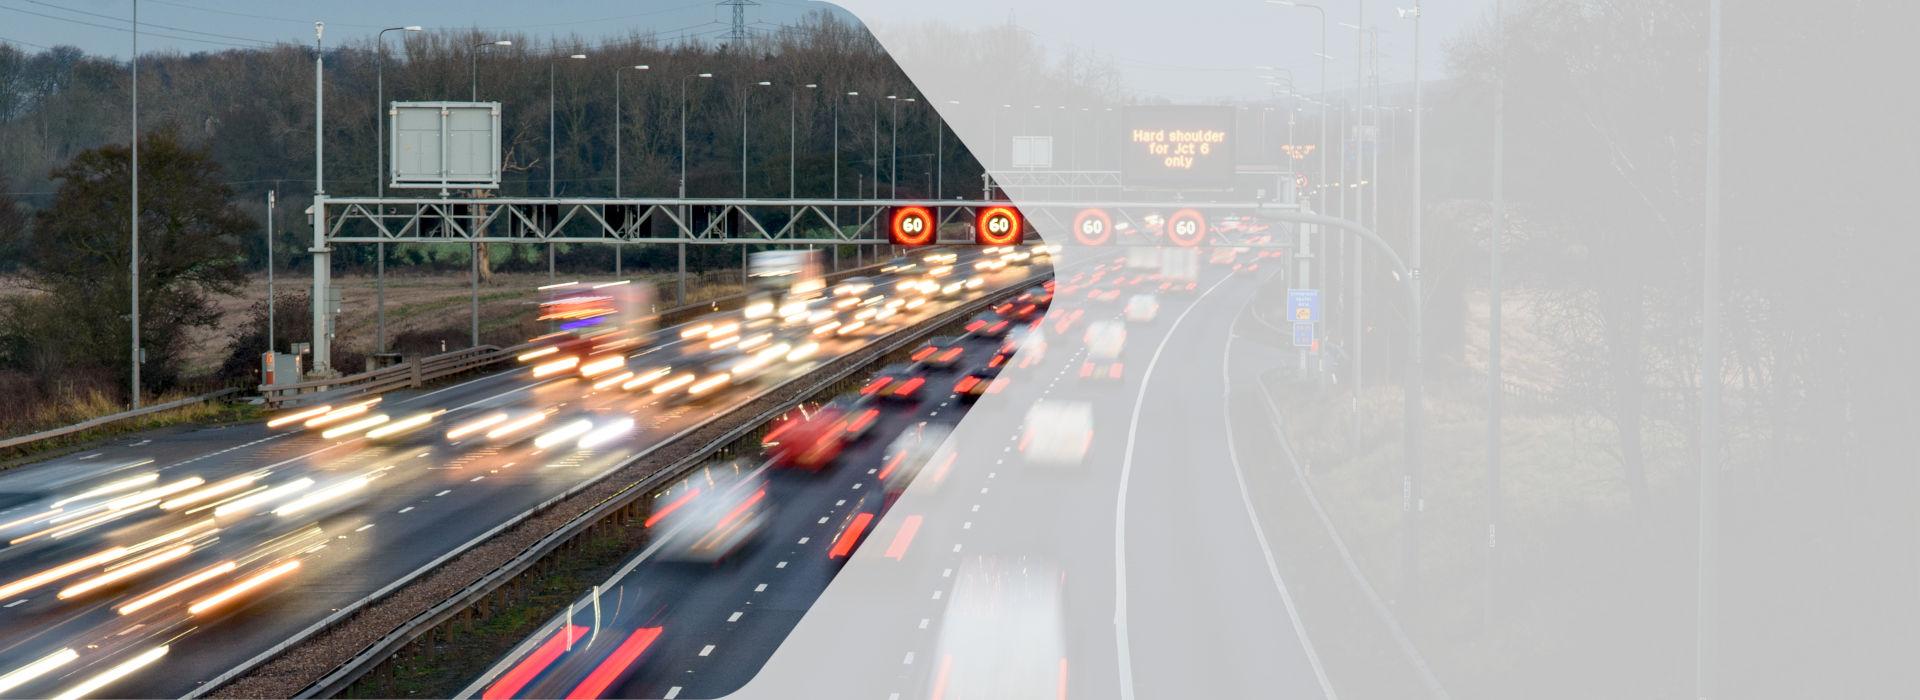 Dynamisk trafikstyrning